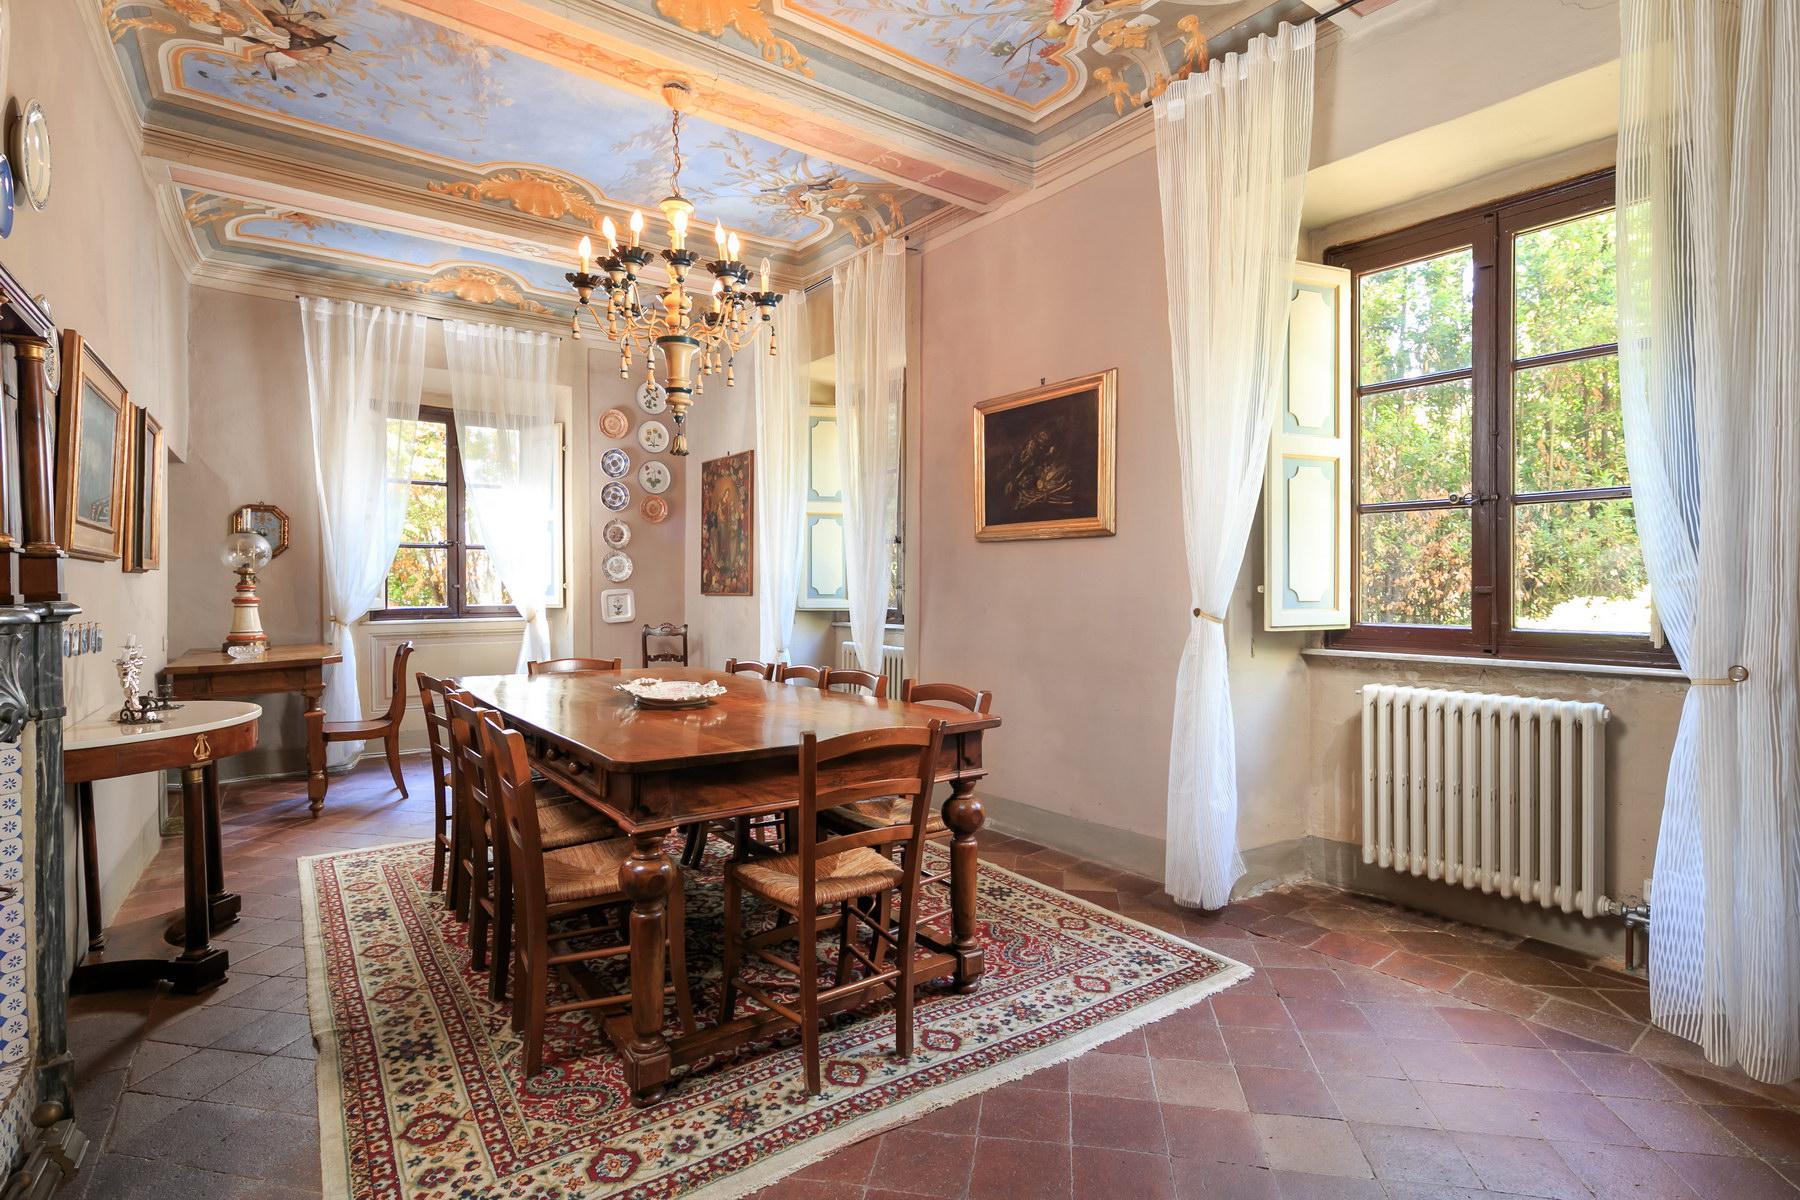 Villa in Vendita a Capannori: 5 locali, 570 mq - Foto 7